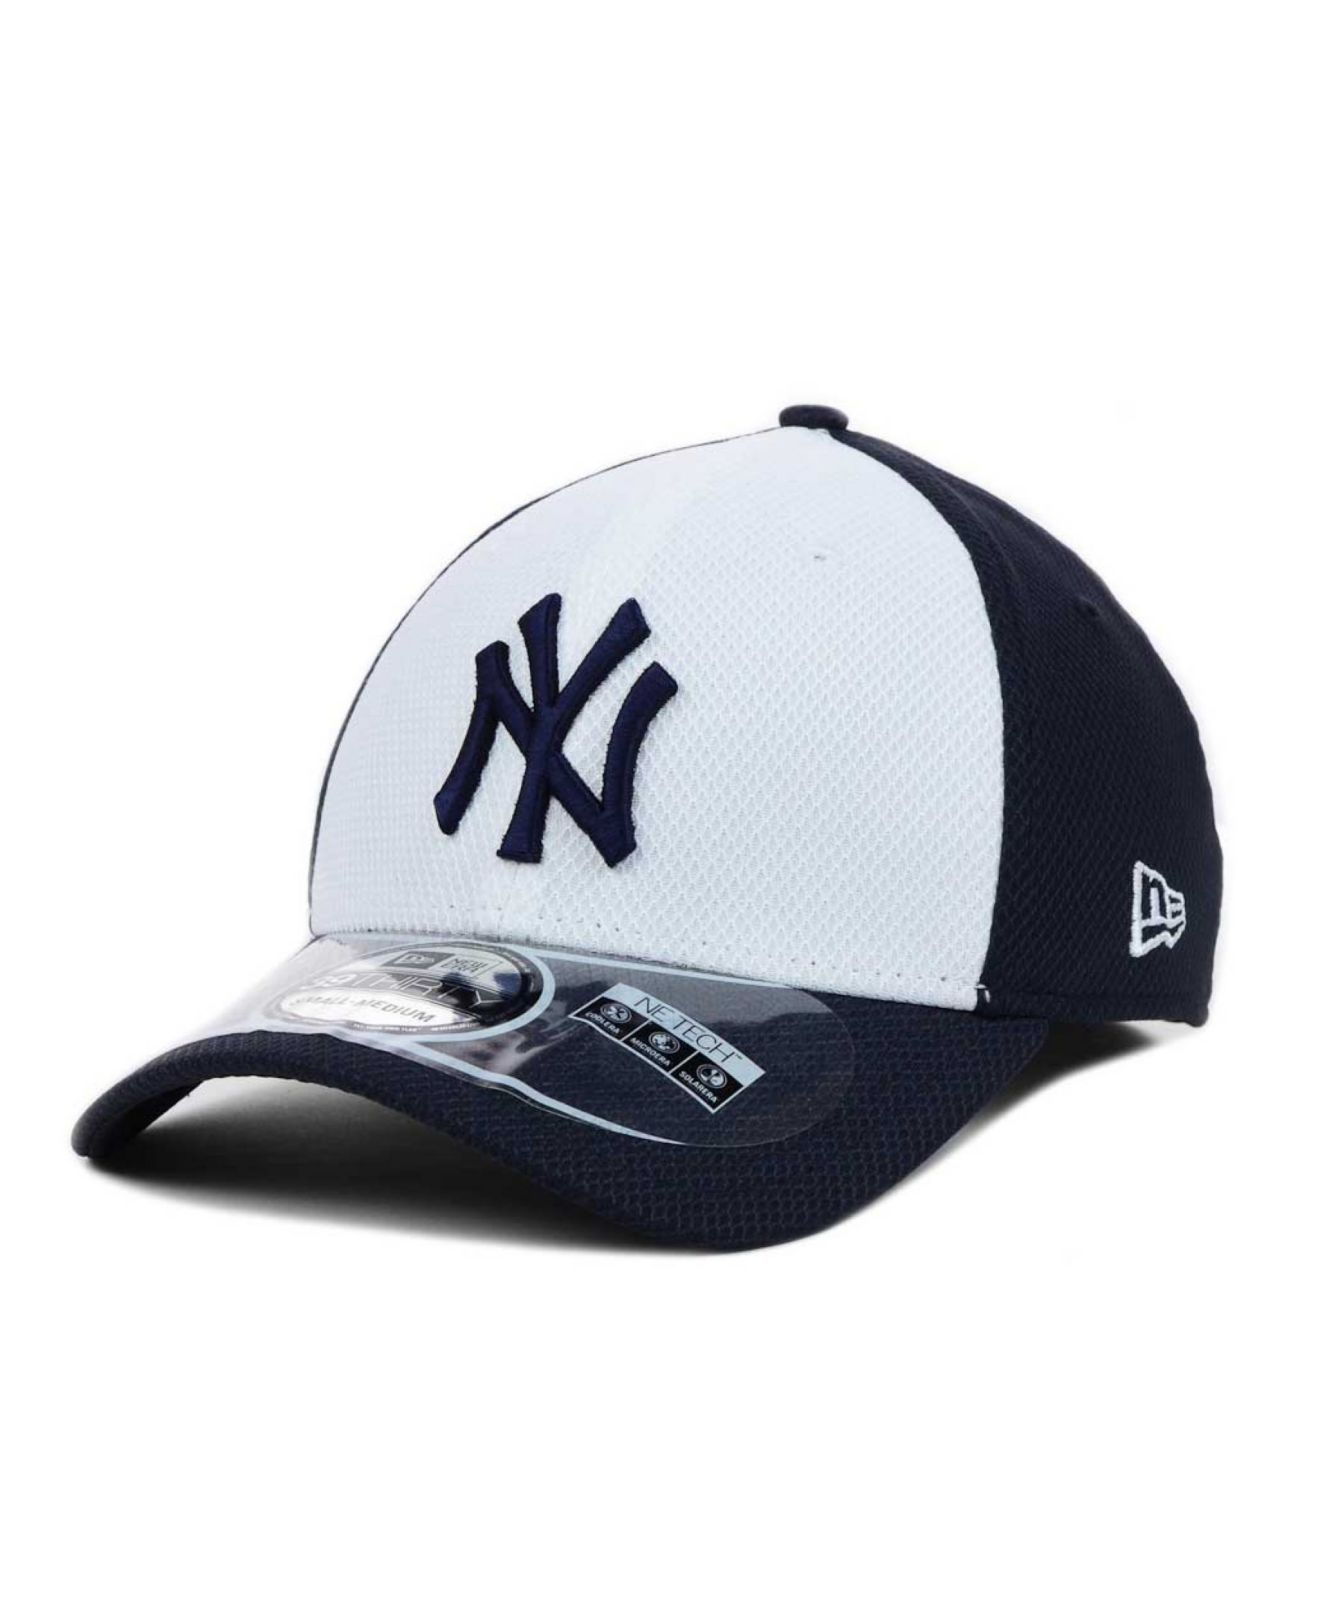 b3febd7c5df Lyst - KTZ New York Yankees Diamond Era 39thirty Cap in Blue for Men